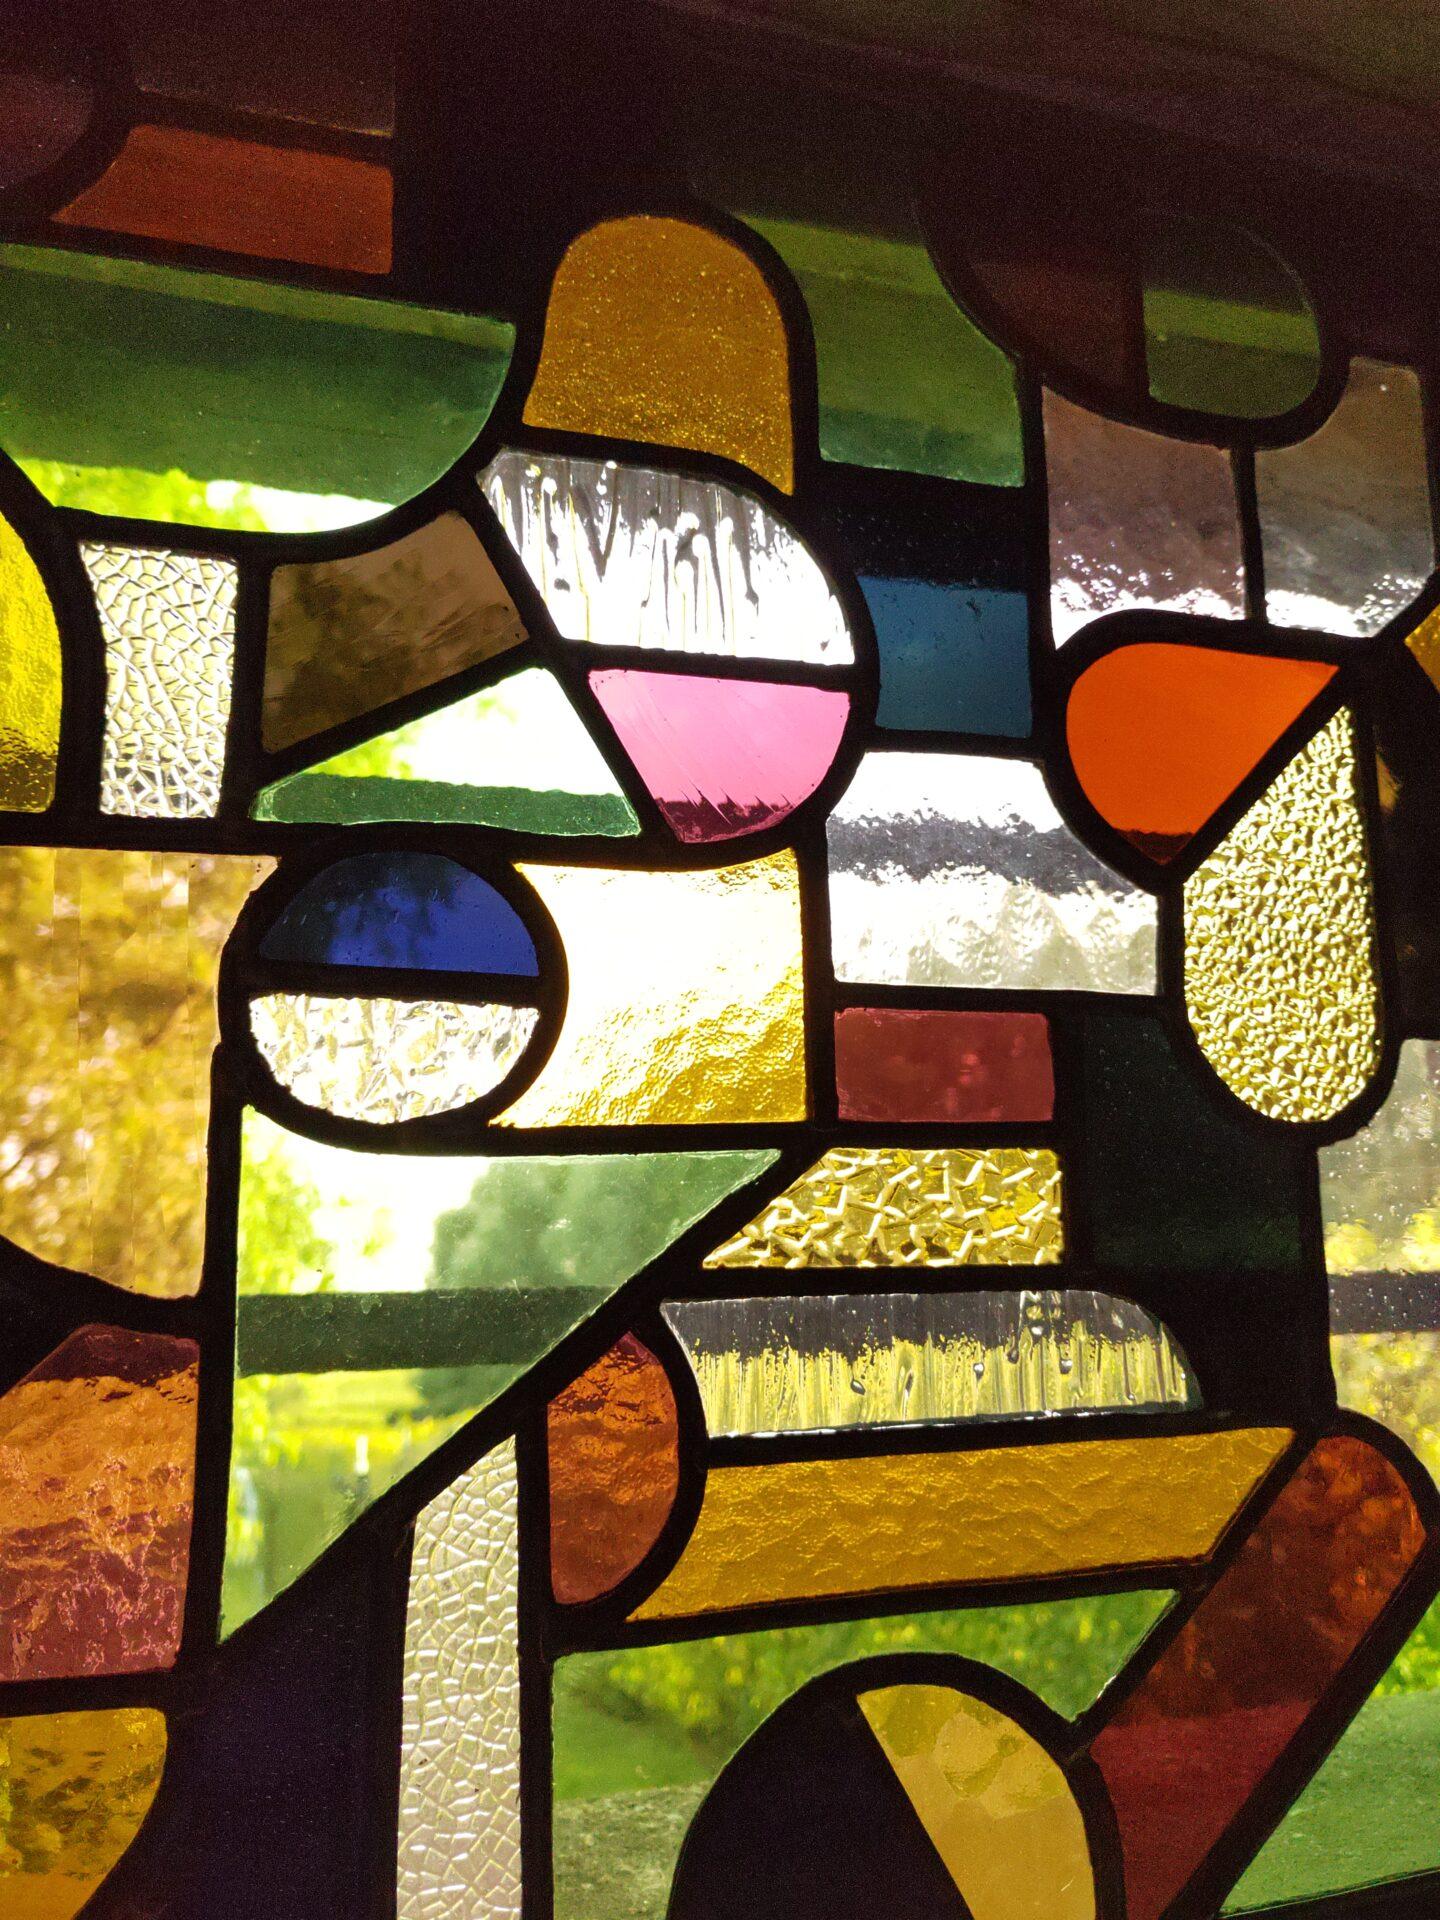 Illumen realisatie van Glas-in-lood